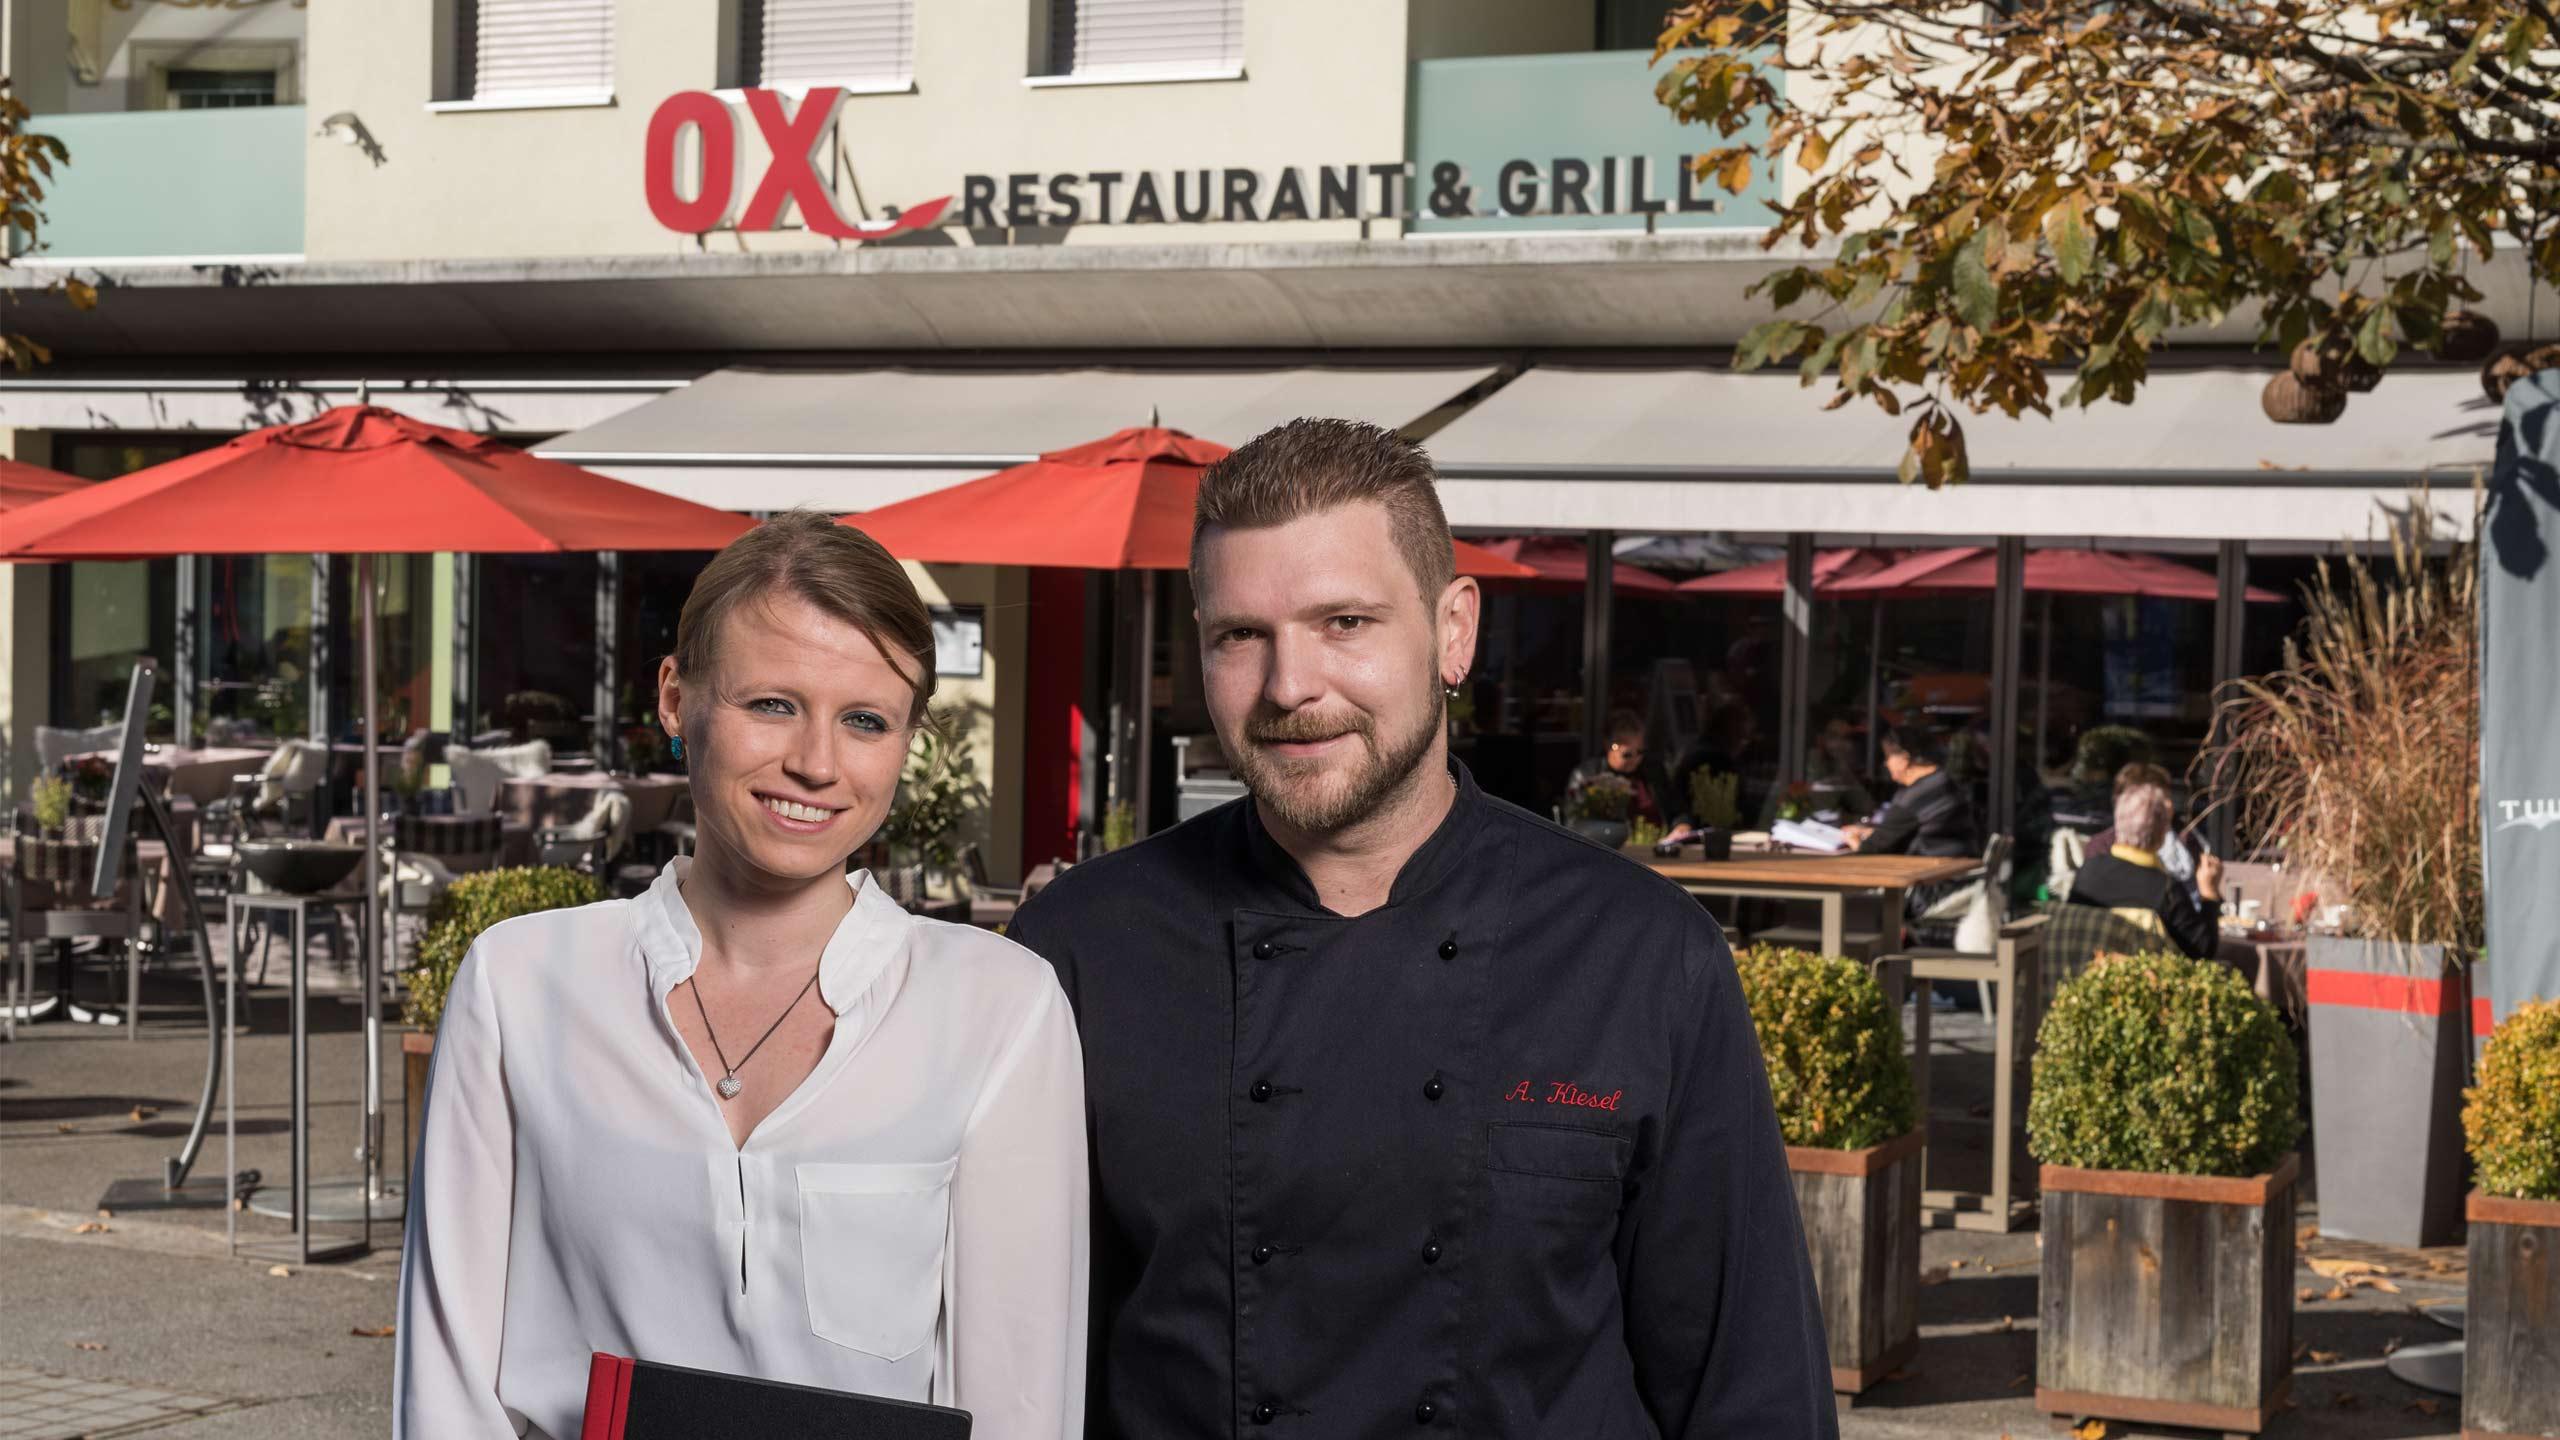 restaurant-grill-ox-interlaken-corinne-feller-andy-kiesel.jpg